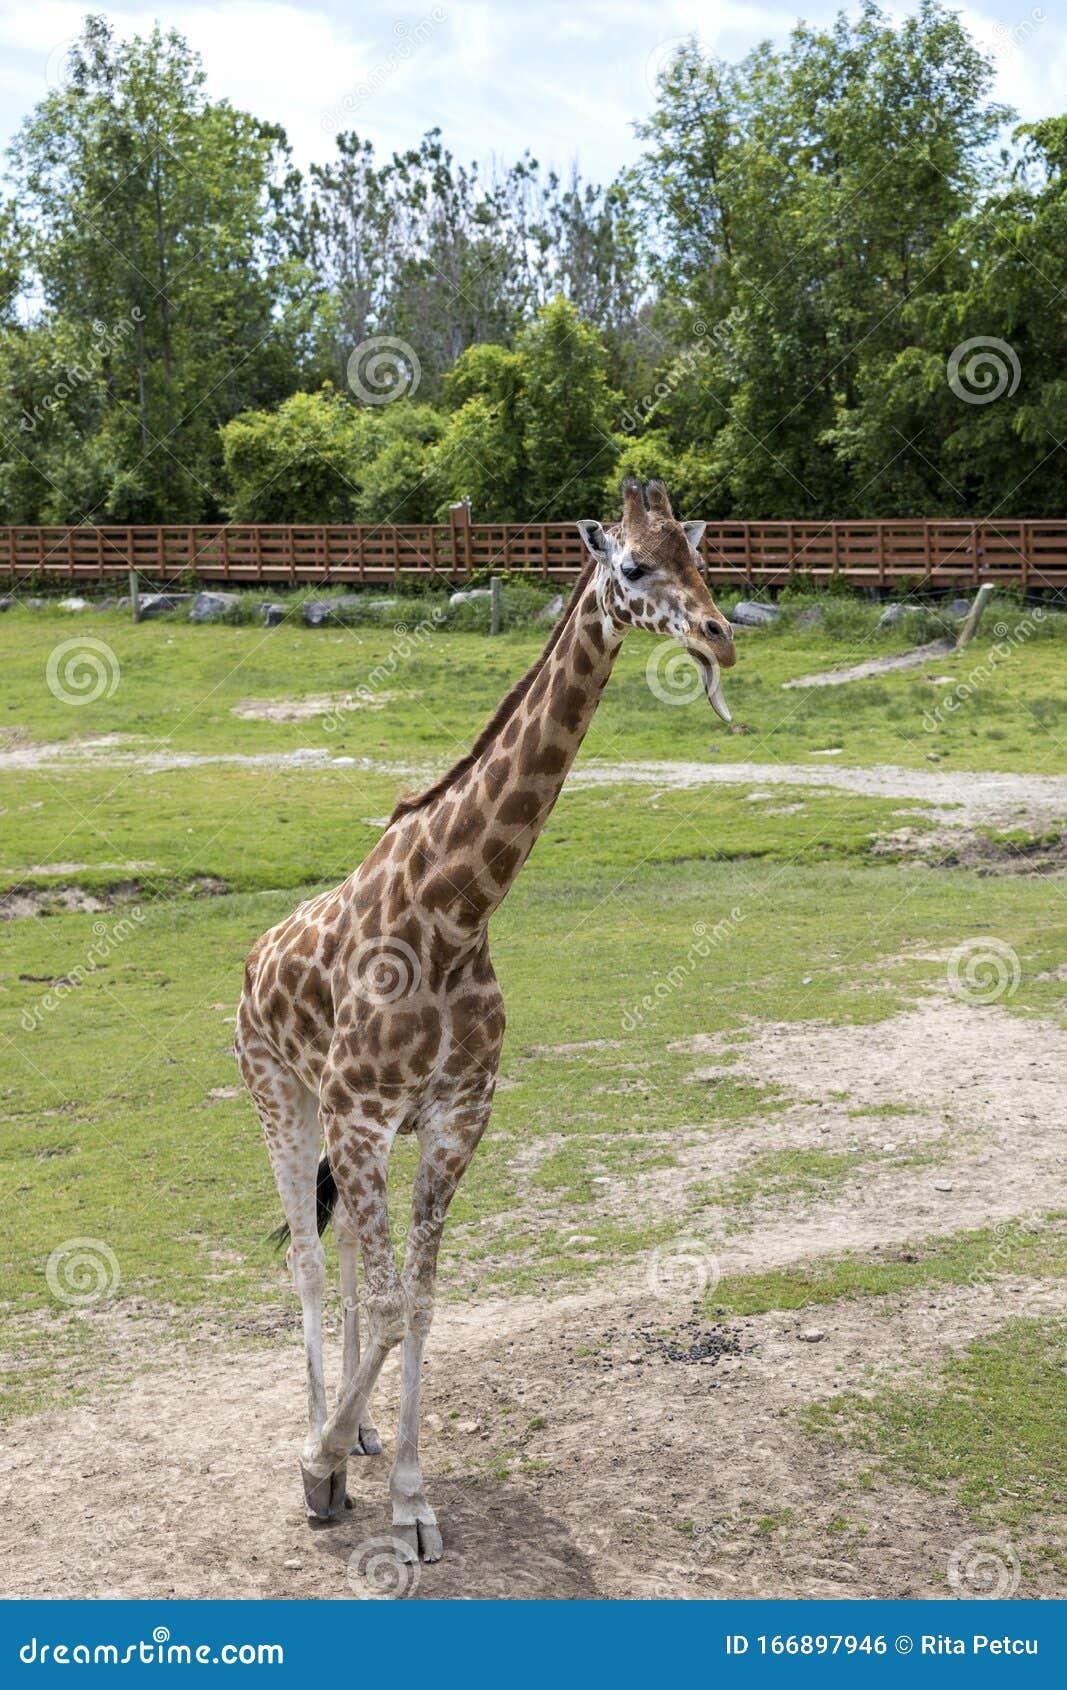 Giraffe Sticking The Tongue At The Zoo Stock Photo - Image